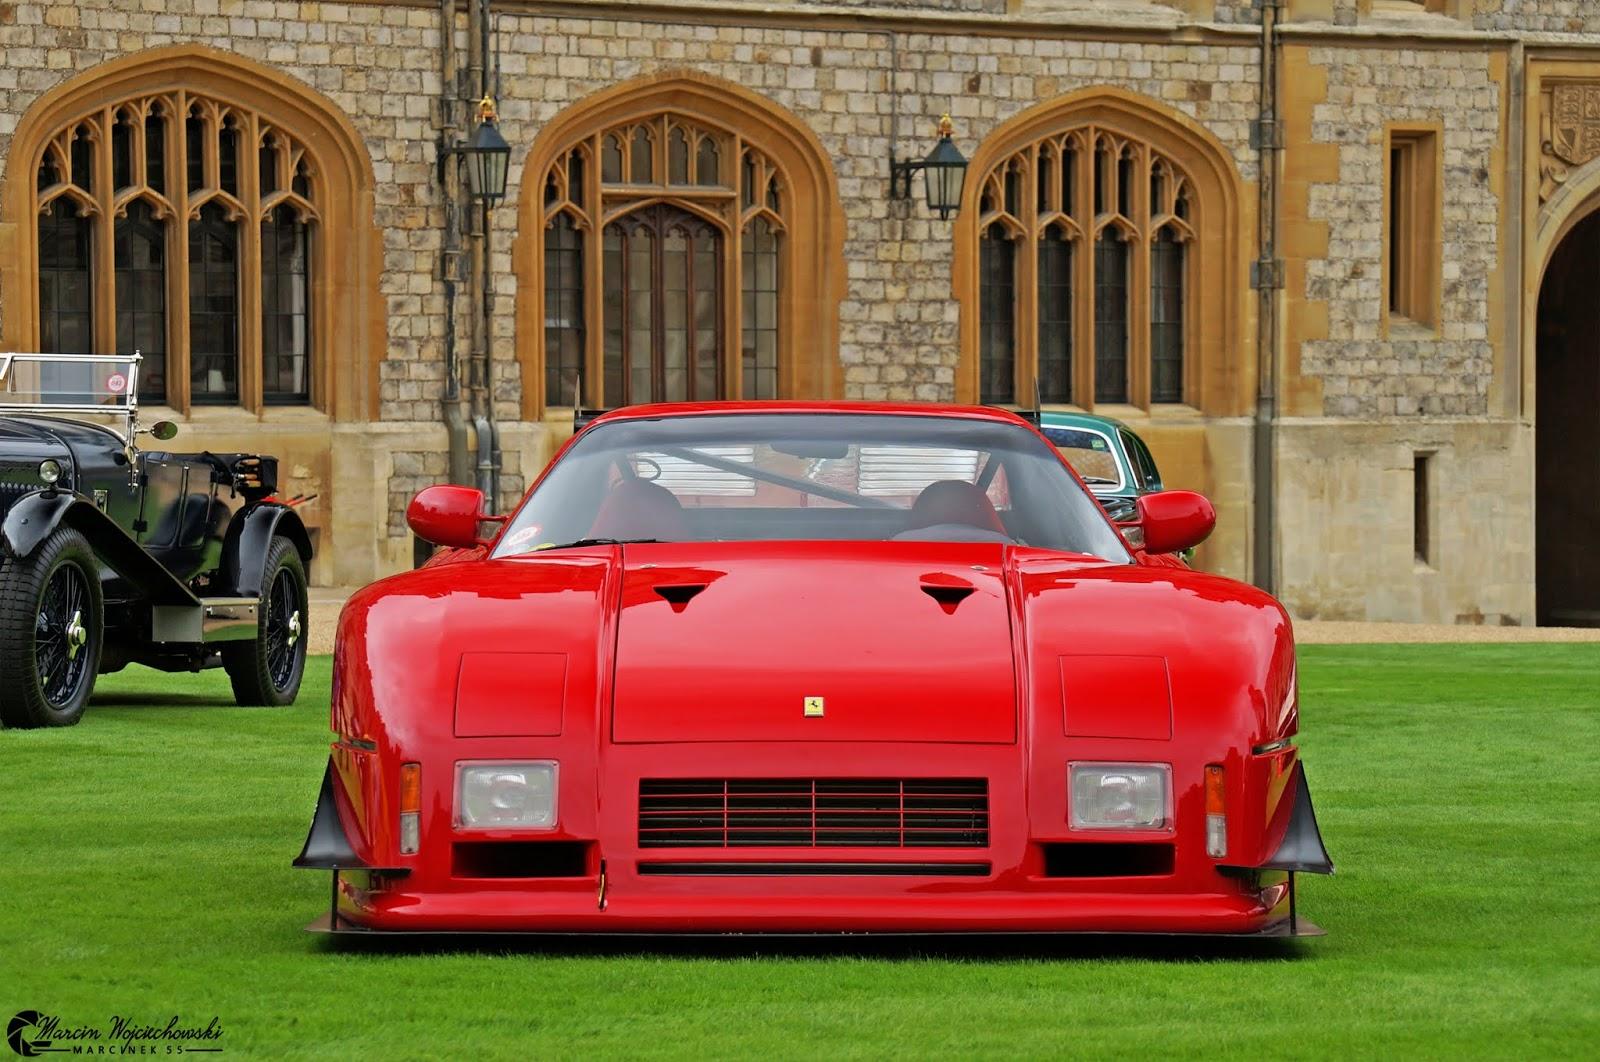 29539901143 eabd03e734 o 288 GTO. Η αρχή της Big 5 του Maranello 288, 288 GTO, Ferrari, GTO, retrocar, retrocar sunday, turbo, twin-turbo, V8, zblog